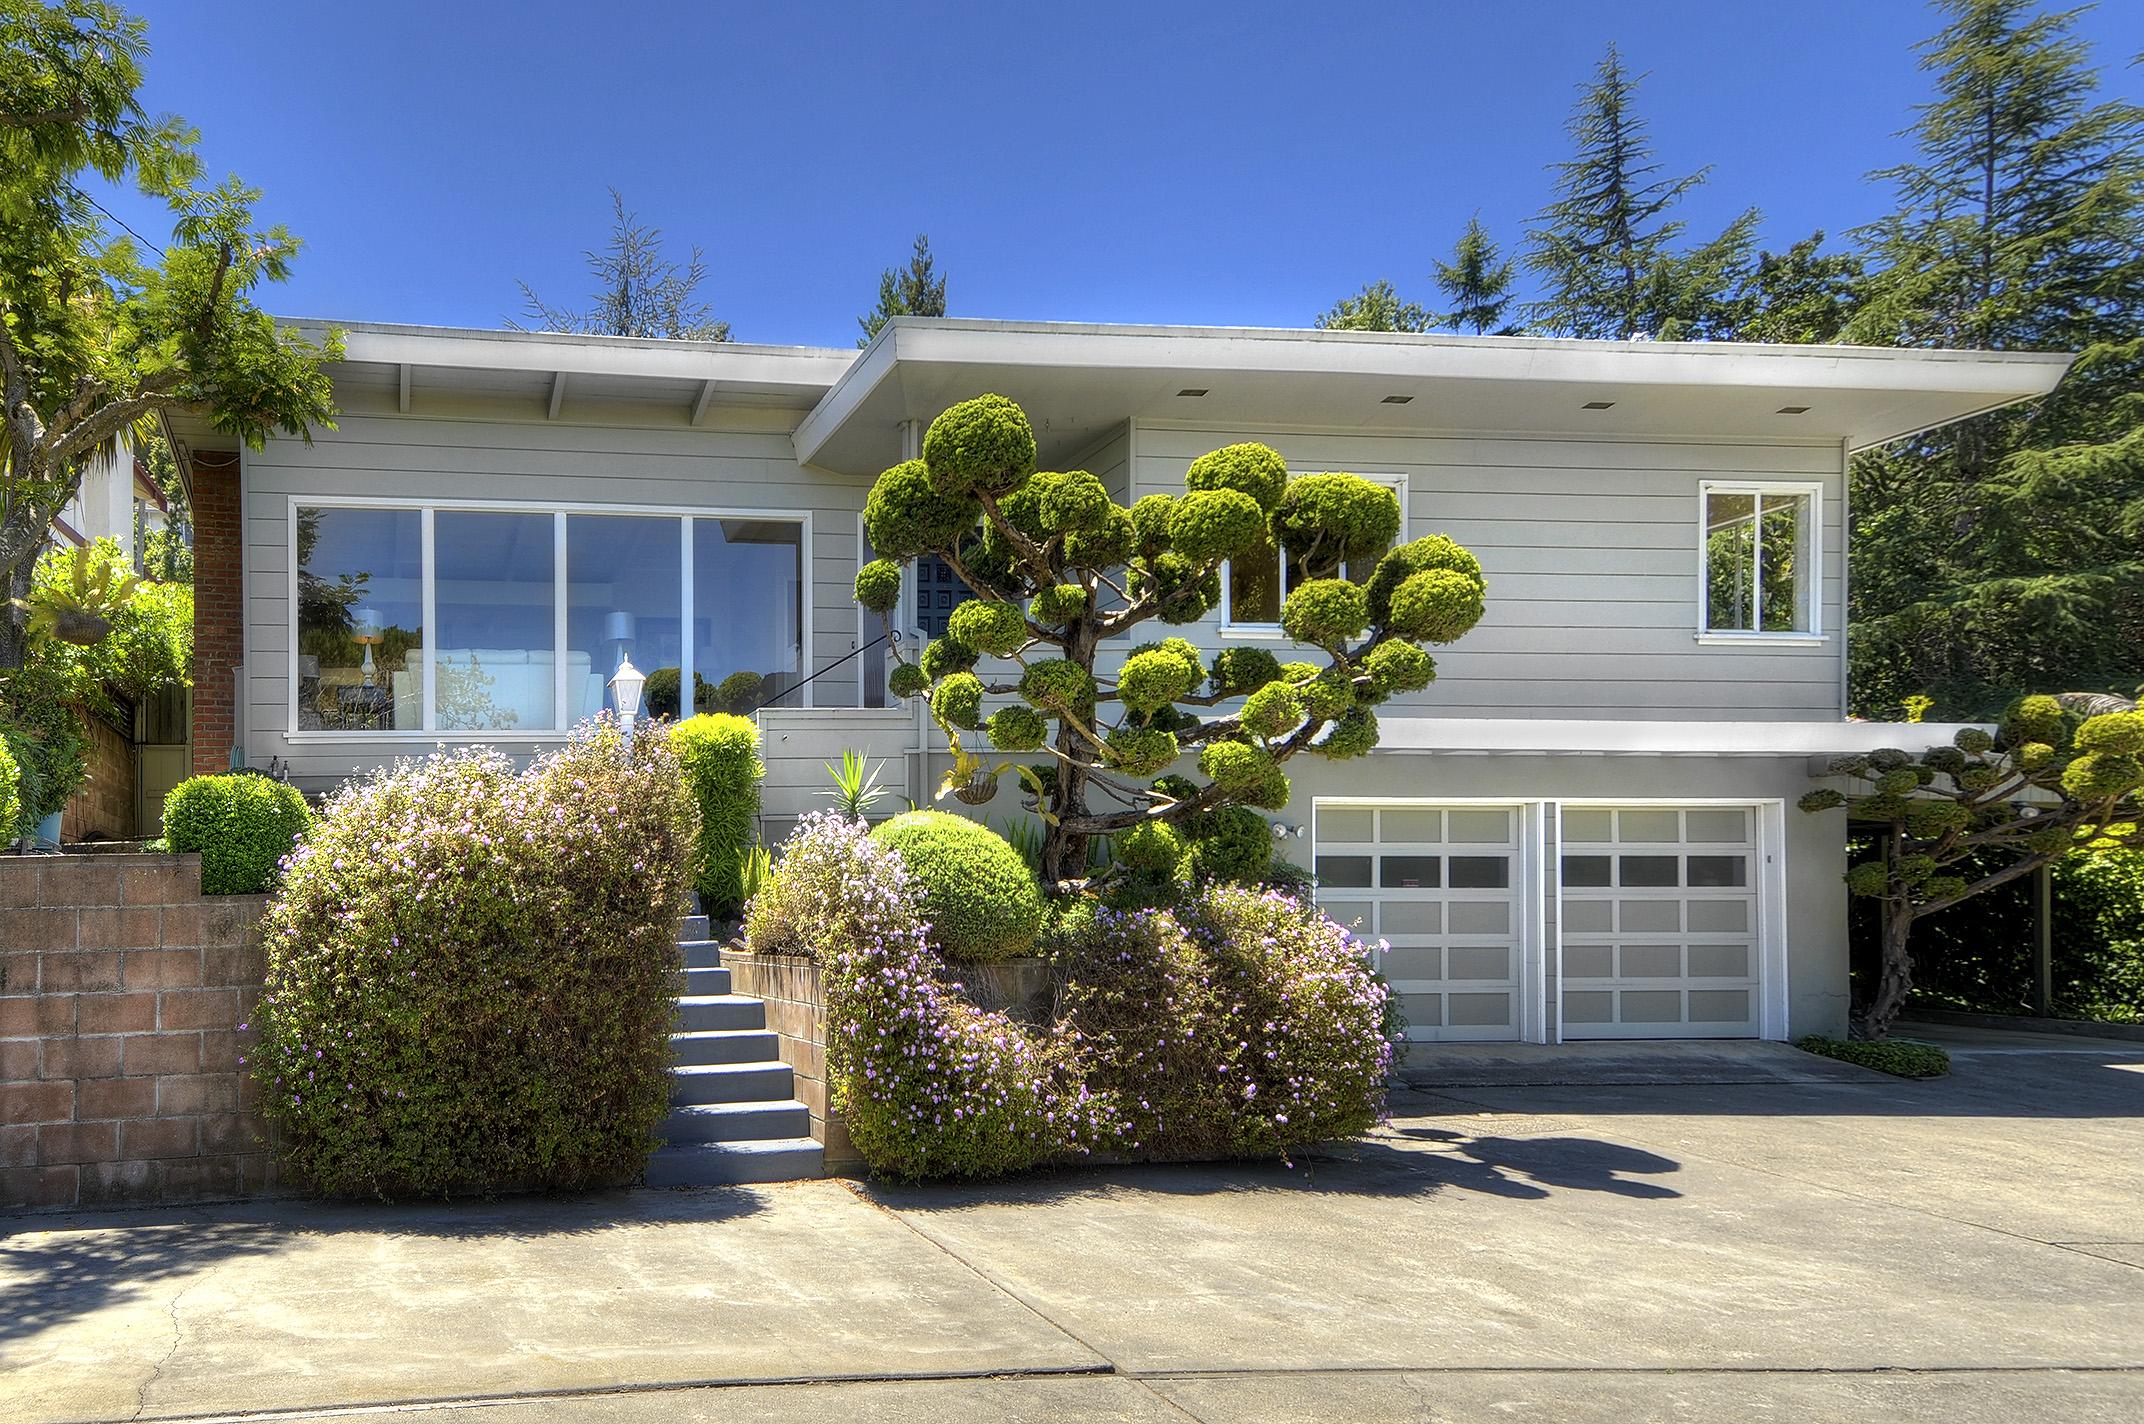 242 Upland Rd, Redwood City, CA 94062